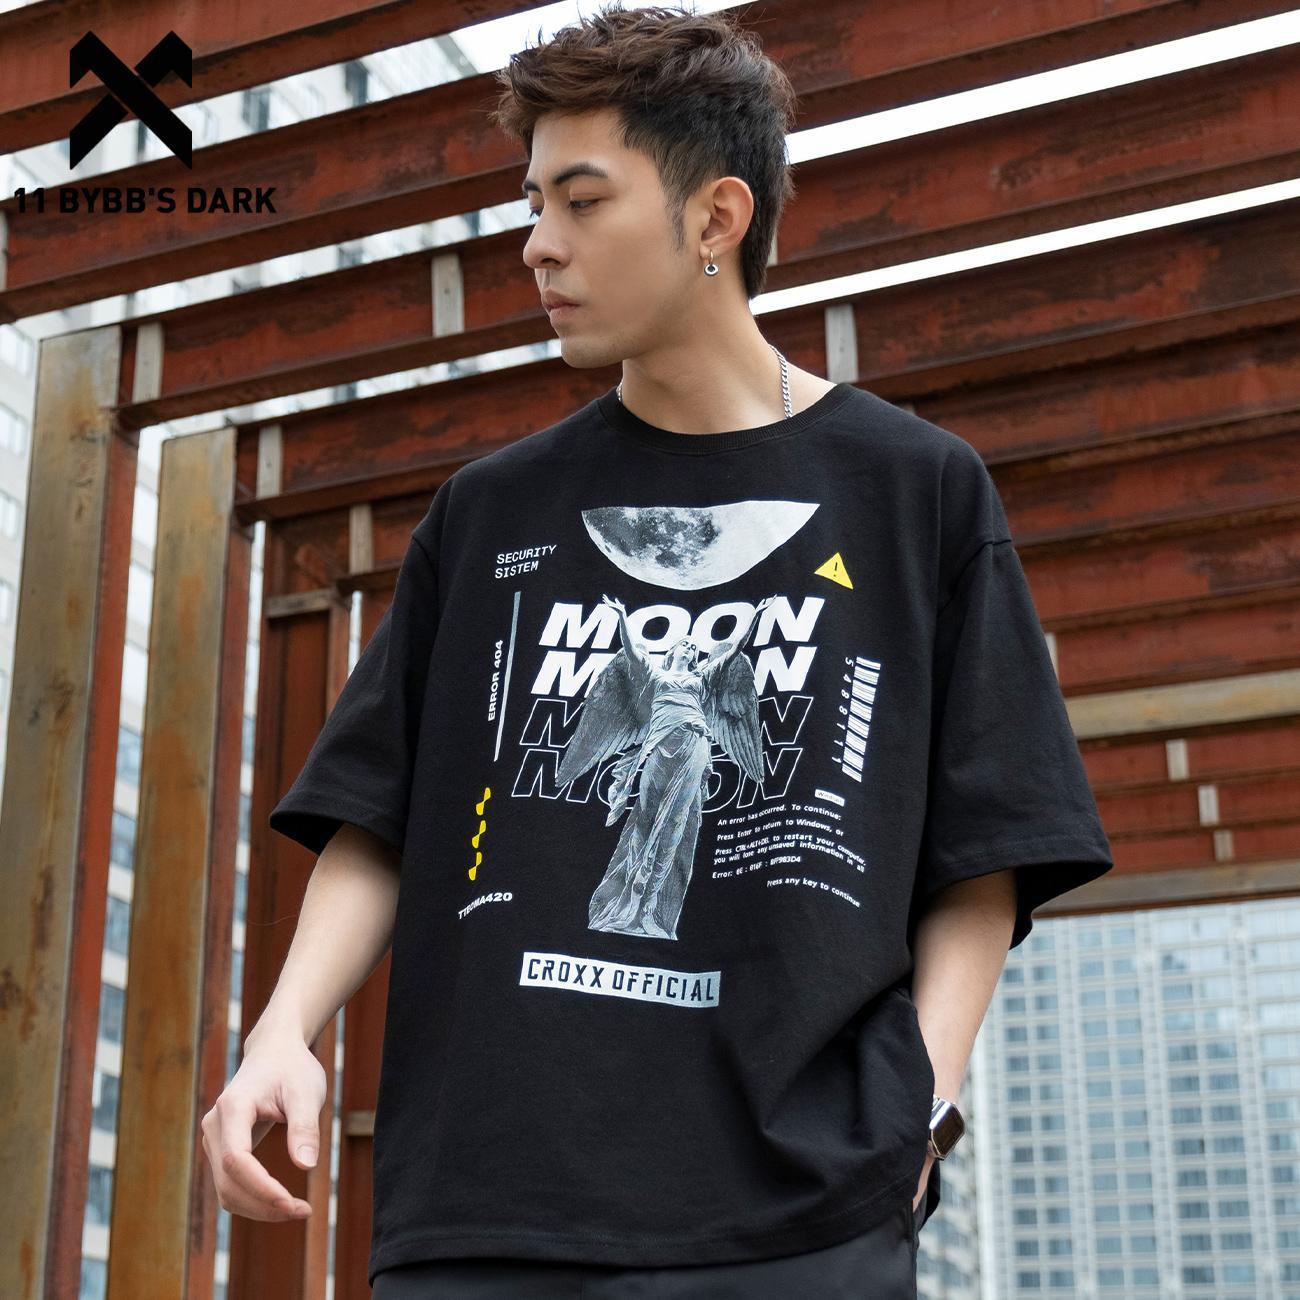 11 BYBB'S الظلام الهيب هوب تي شيرت الرجال الصيف القمر الملاك النحت طباعة القطن فضفاضة قصيرة الأكمام قمصان الشارع الشهير Harajuku التي شيرت